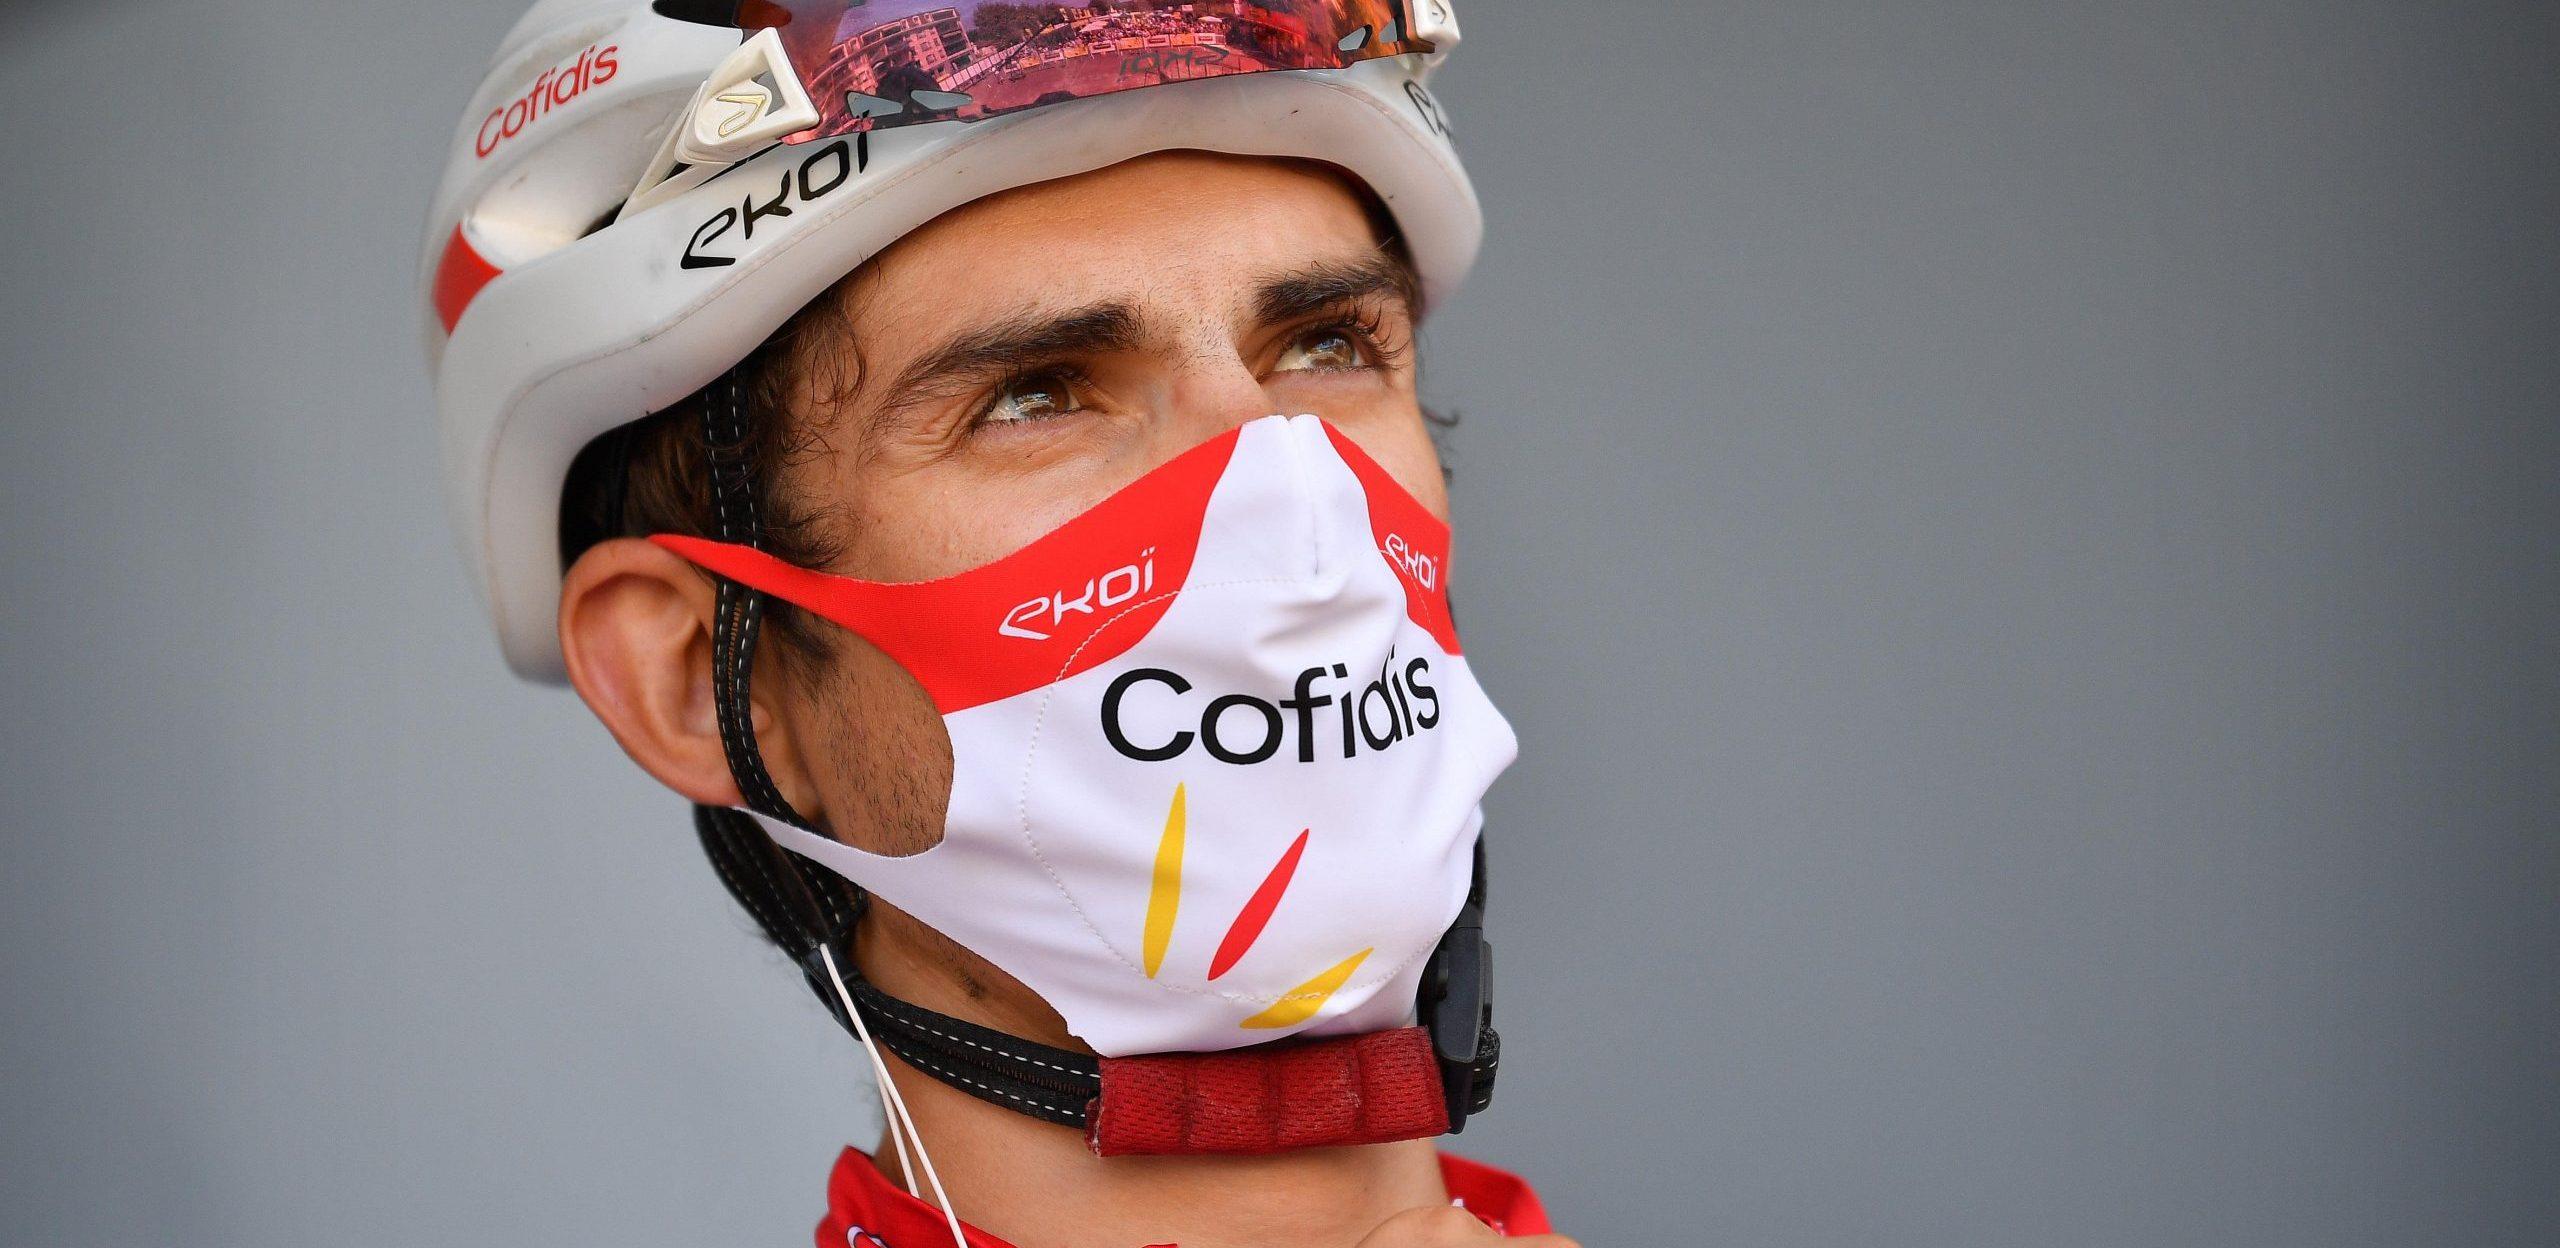 Cofidis rekent op Guillaume Martin in Amstel Gold Race ...